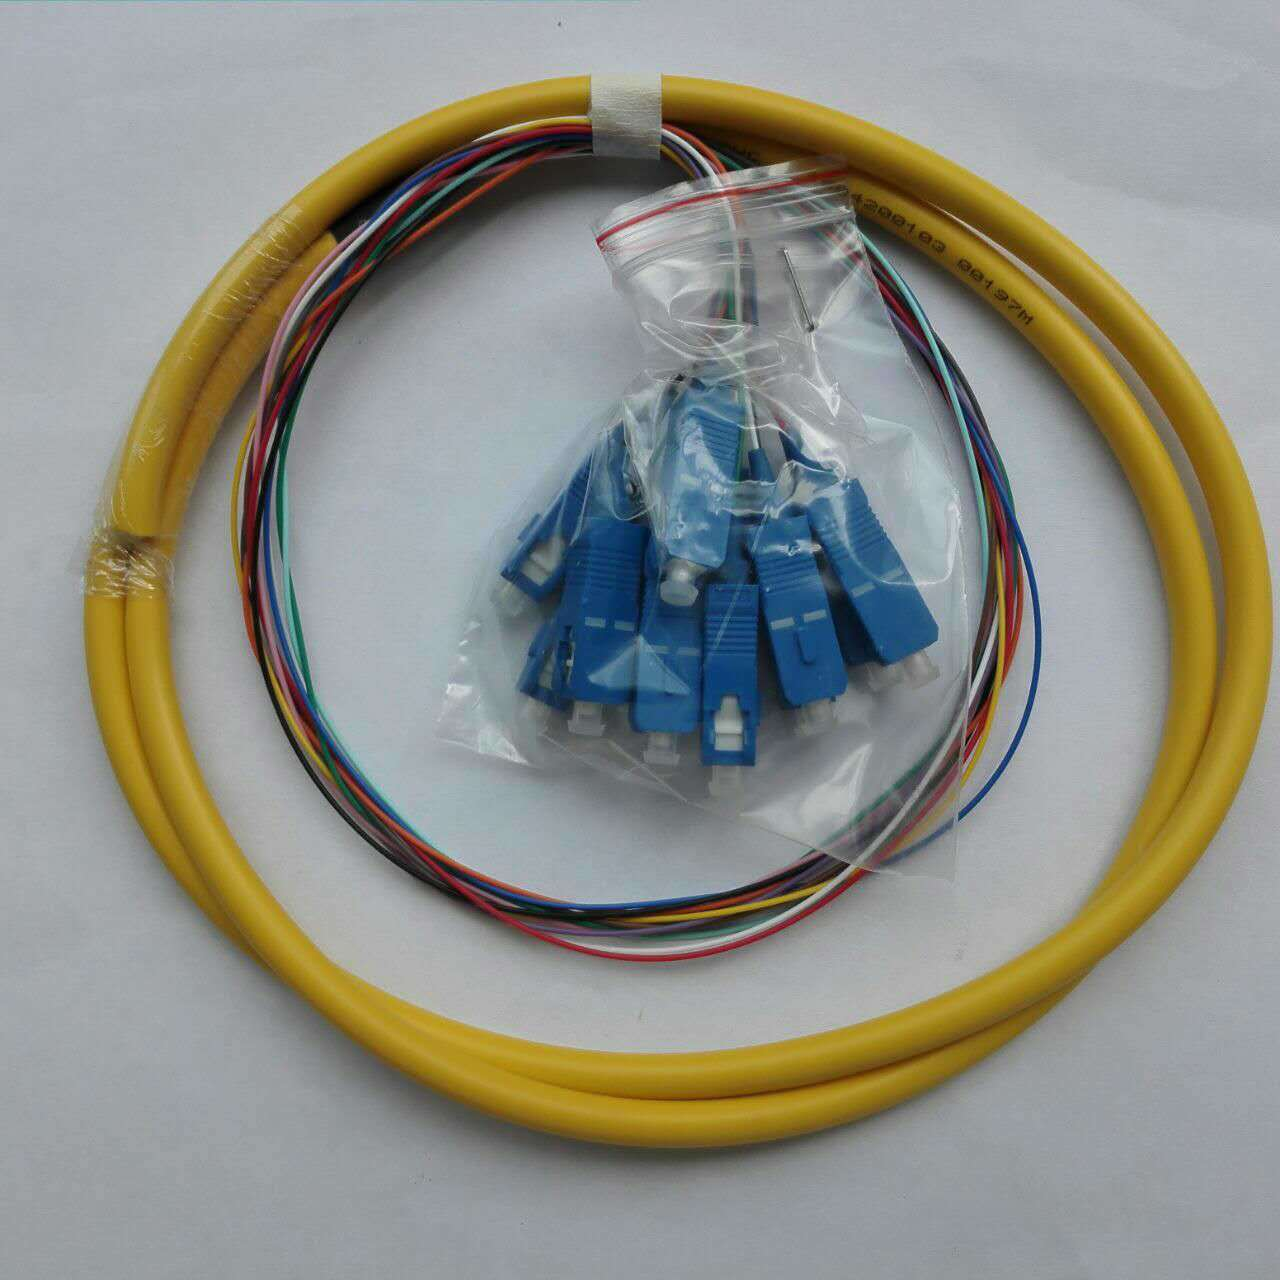 1.5m 12 Cores Bundle Fiber Optical Sc/Upc Sm Sx Pigtail Made in ...